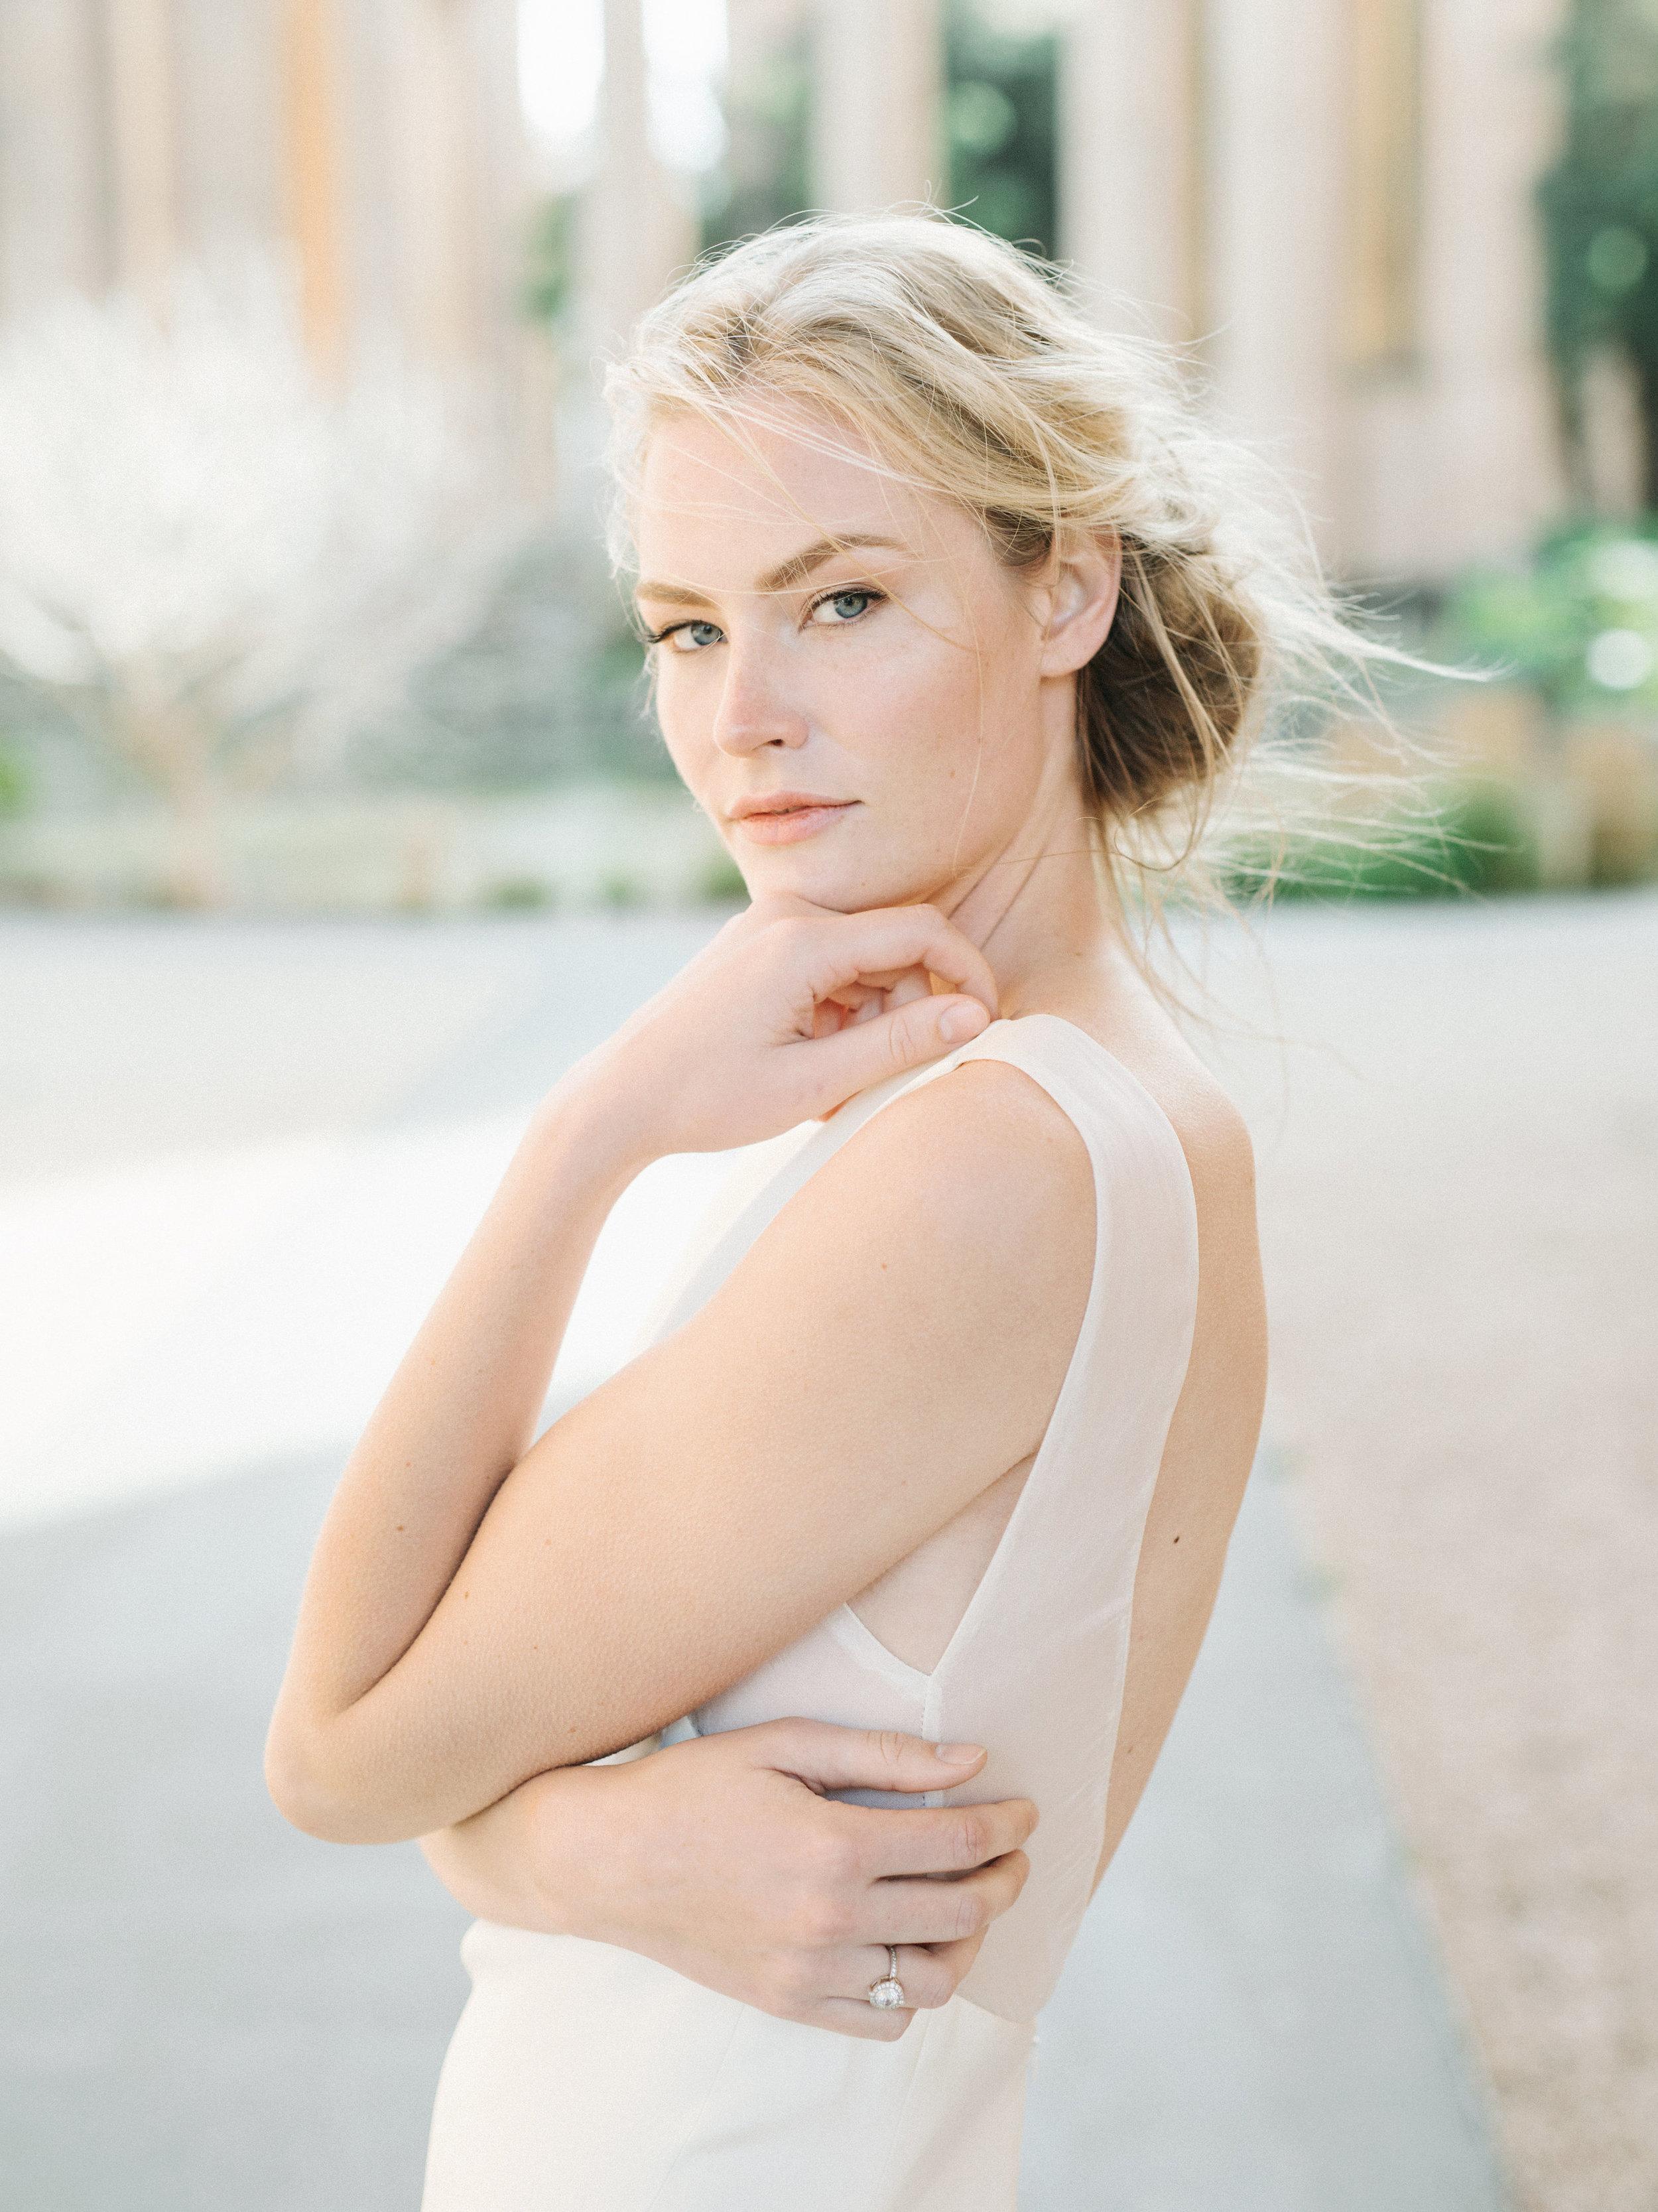 Angela Nunnink Headshot Destination Hair and makeup Artist | San Francisco | Hawaii | High End Weddings | Natural Hair And Makeup | Fresh Hair and Makeup